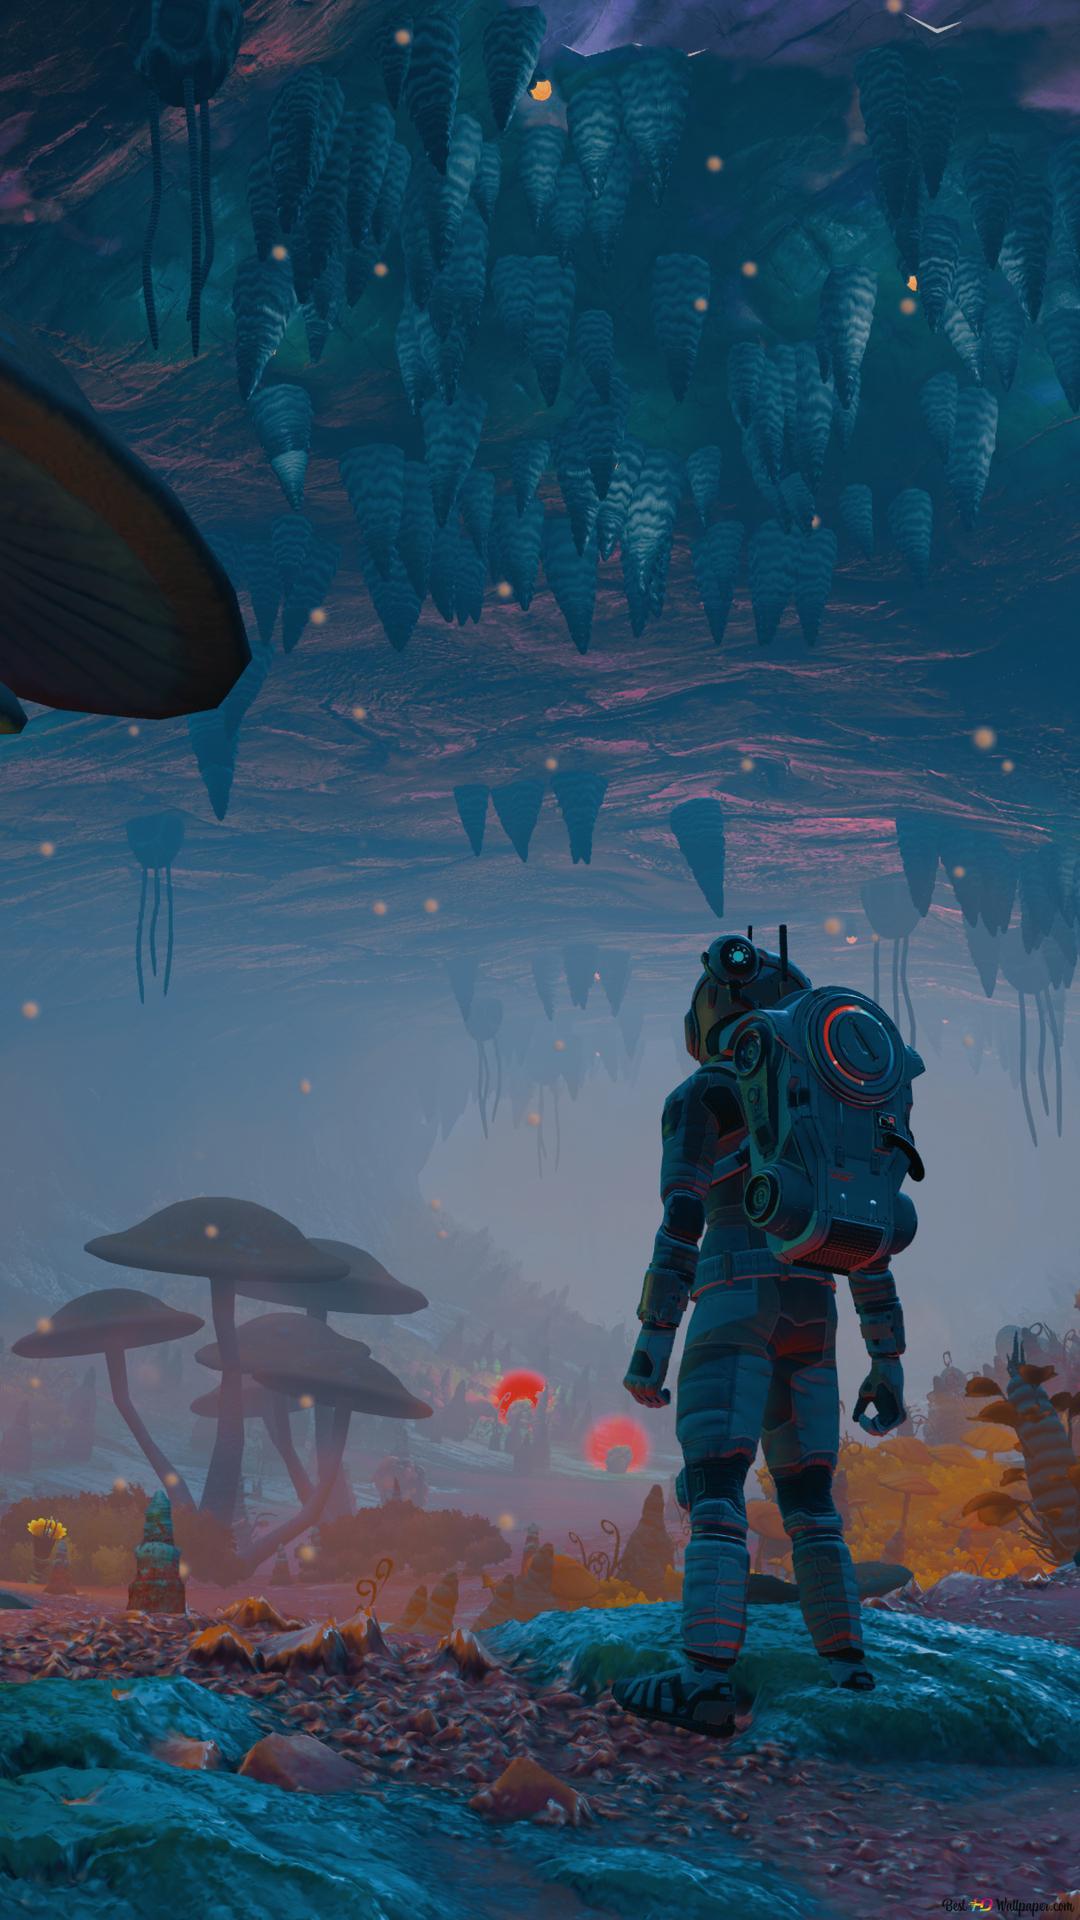 No Man's Sky - (2019) video game HD wallpaper download